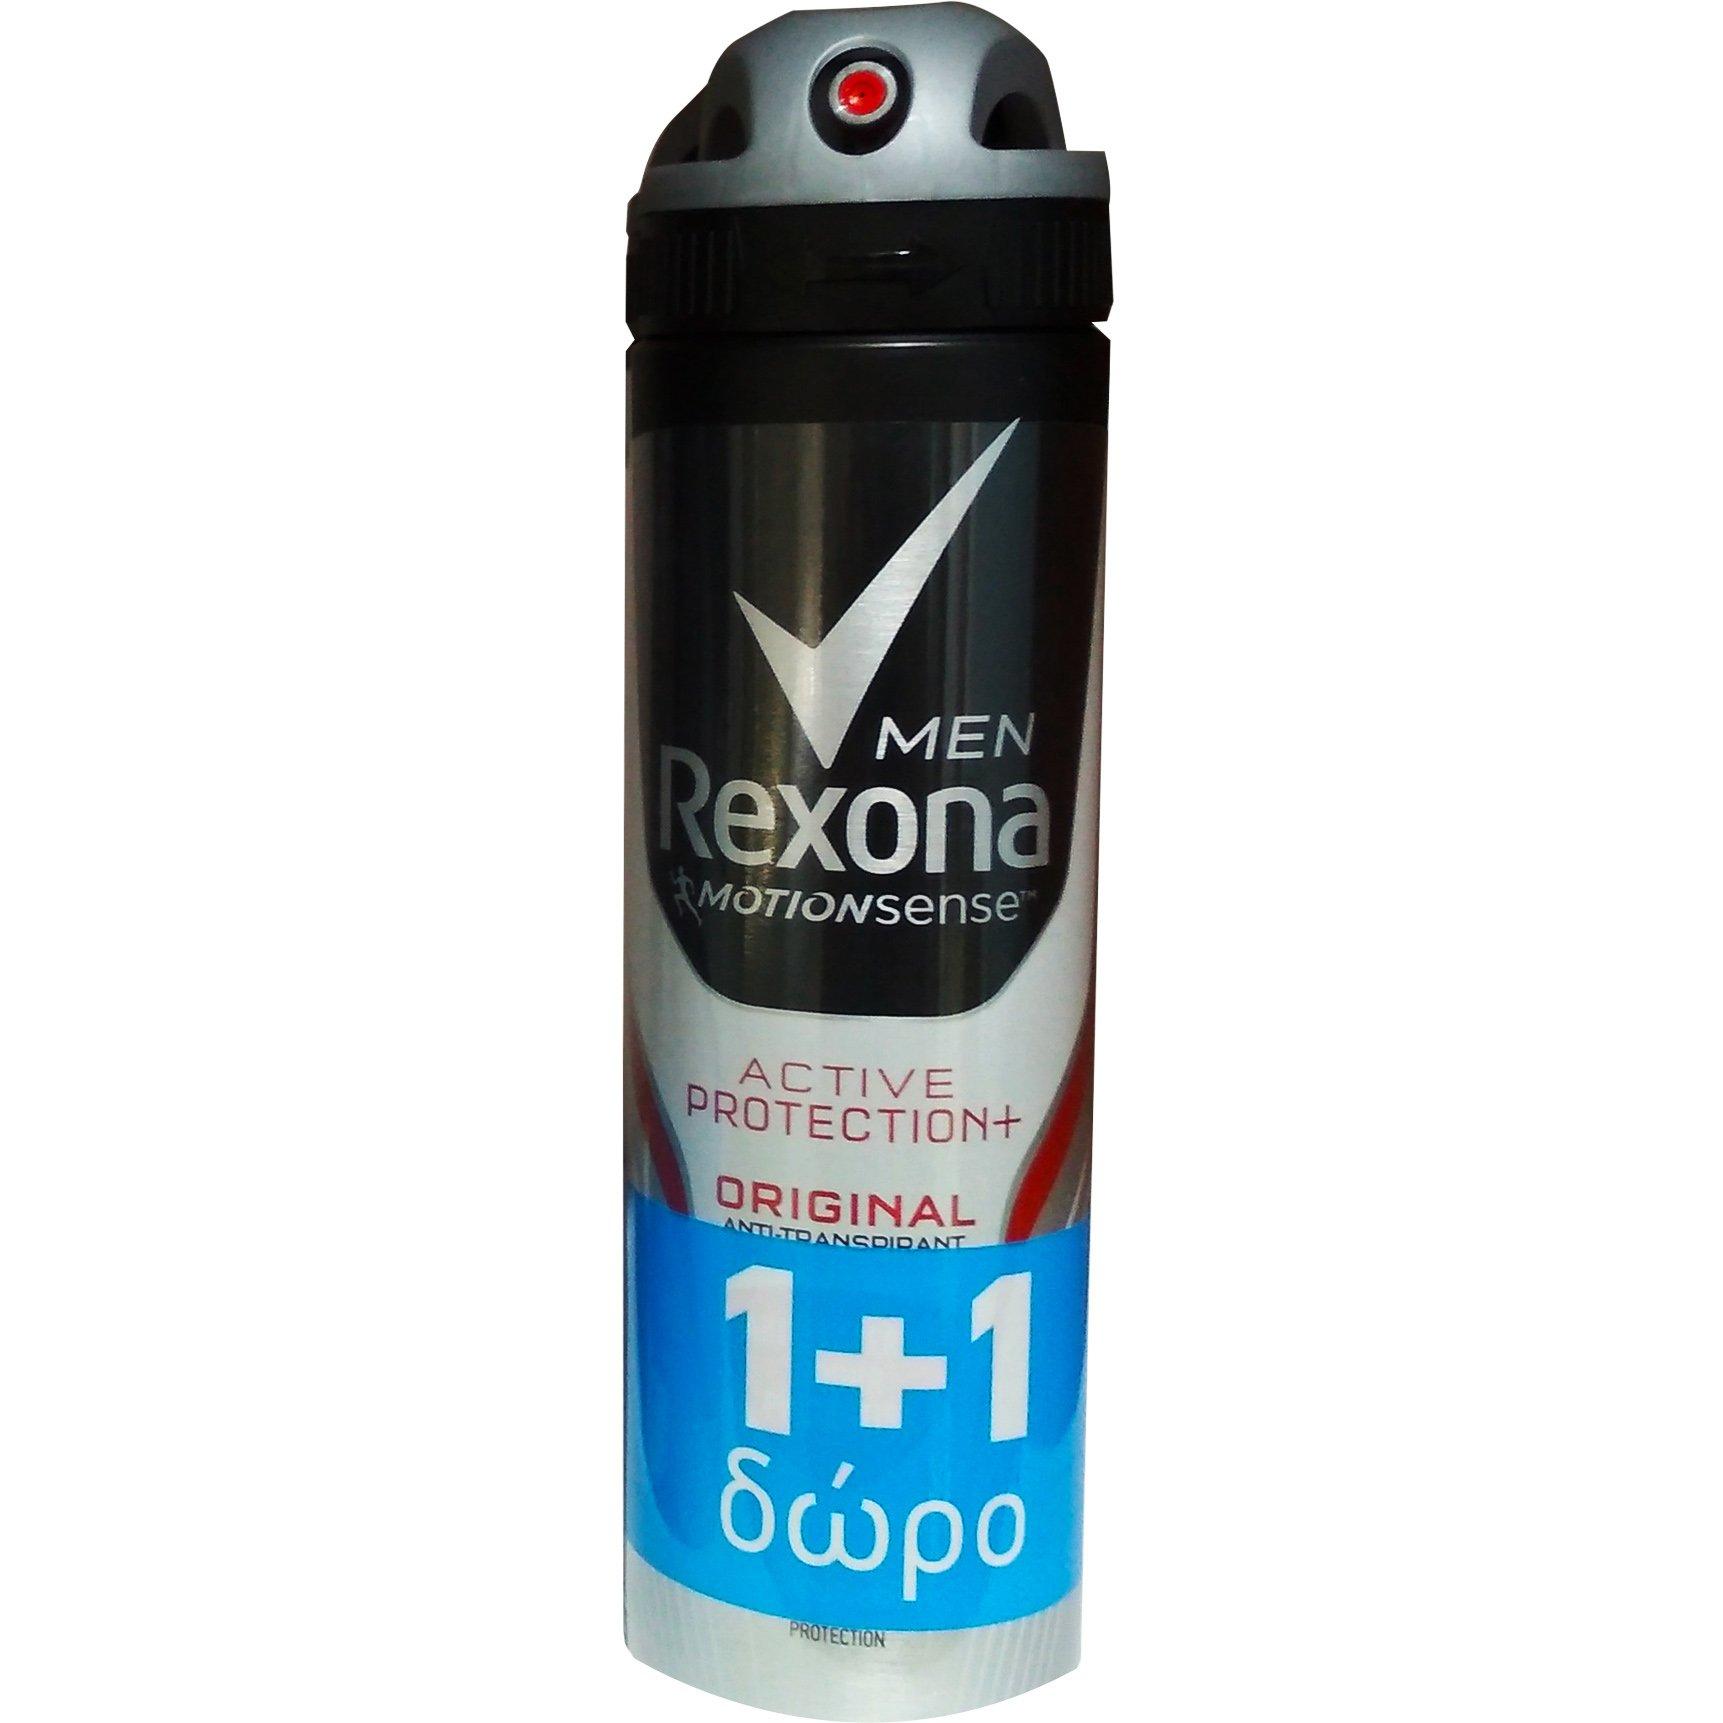 Rexona Πακέτο Προσφοράς Men Deodorant Spray Active Protection Original 48h Ανδρικό Αποσμητικό Σπρει 2x150ml 1+1 Δώρο